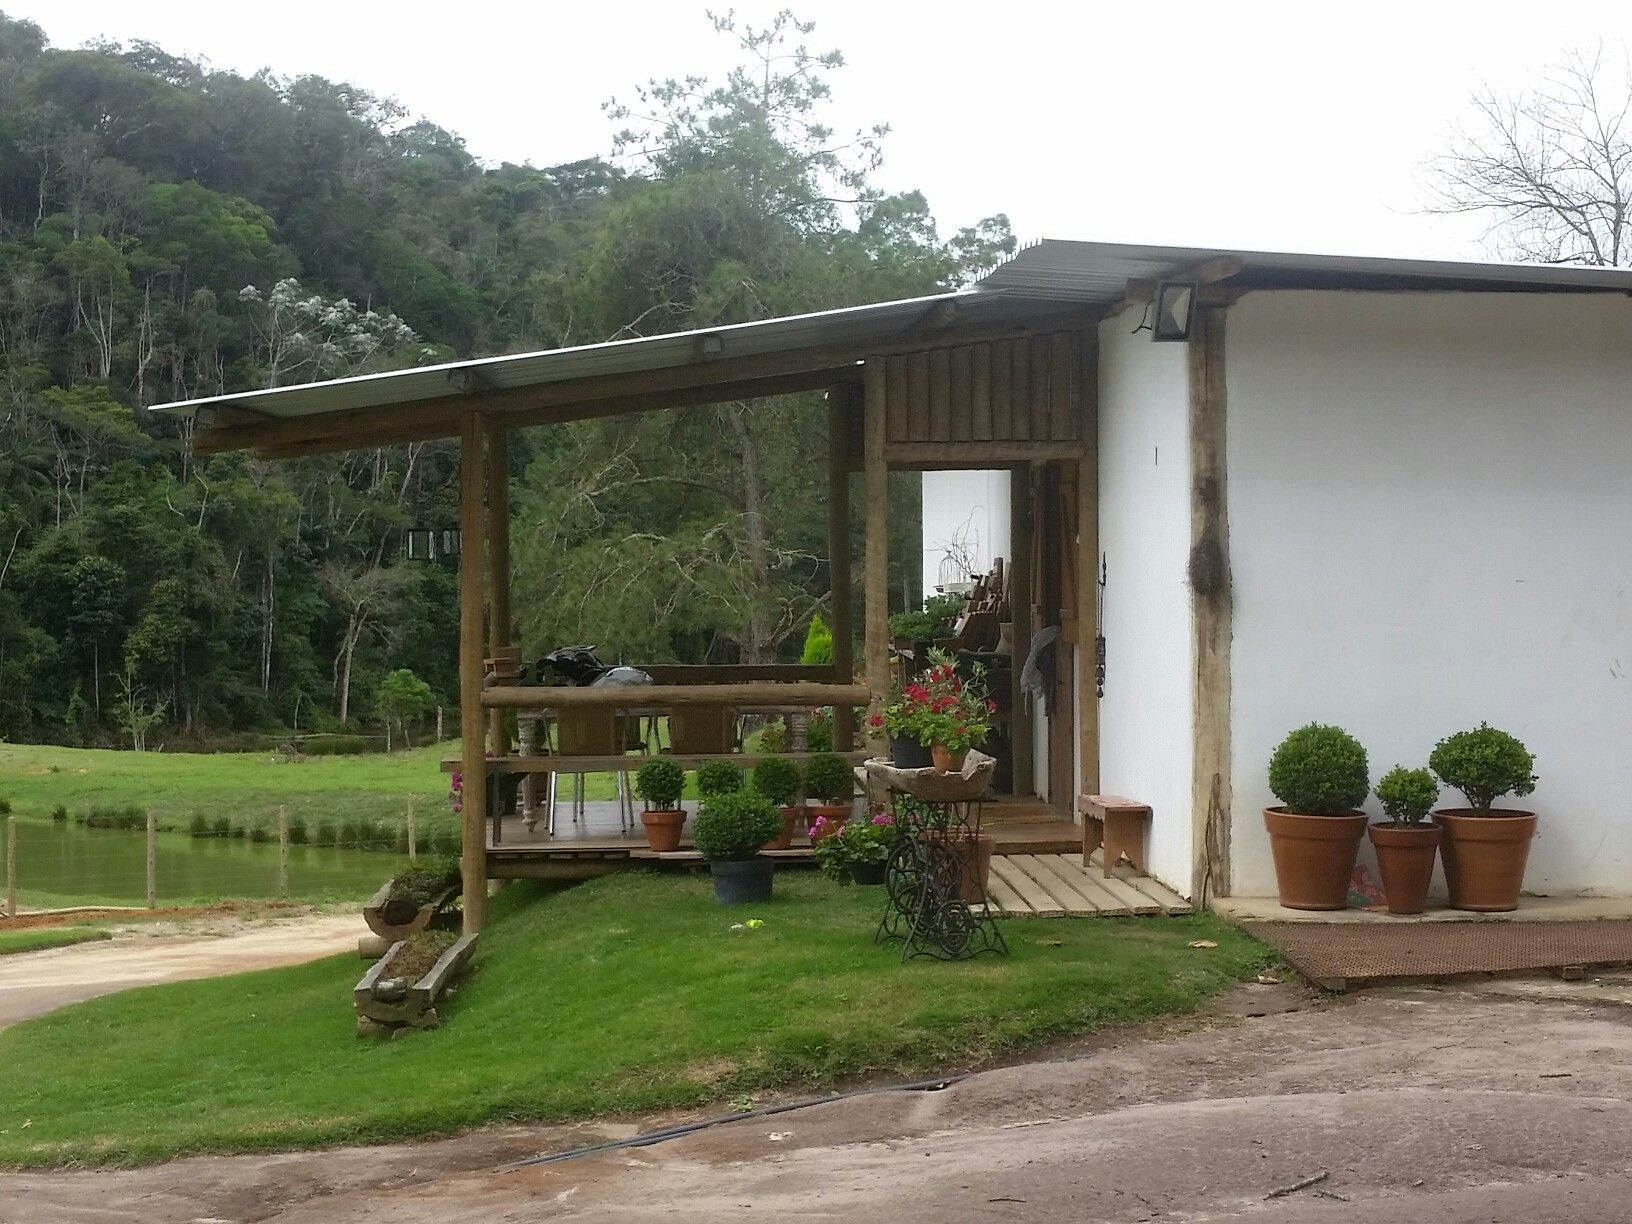 A simple farmhouse in Brazil.  Pedra Azul. Domingos Martins.  Nature. Peace.  Harmony. Oh Lord Jesus!  Oh Senhor Jesus!